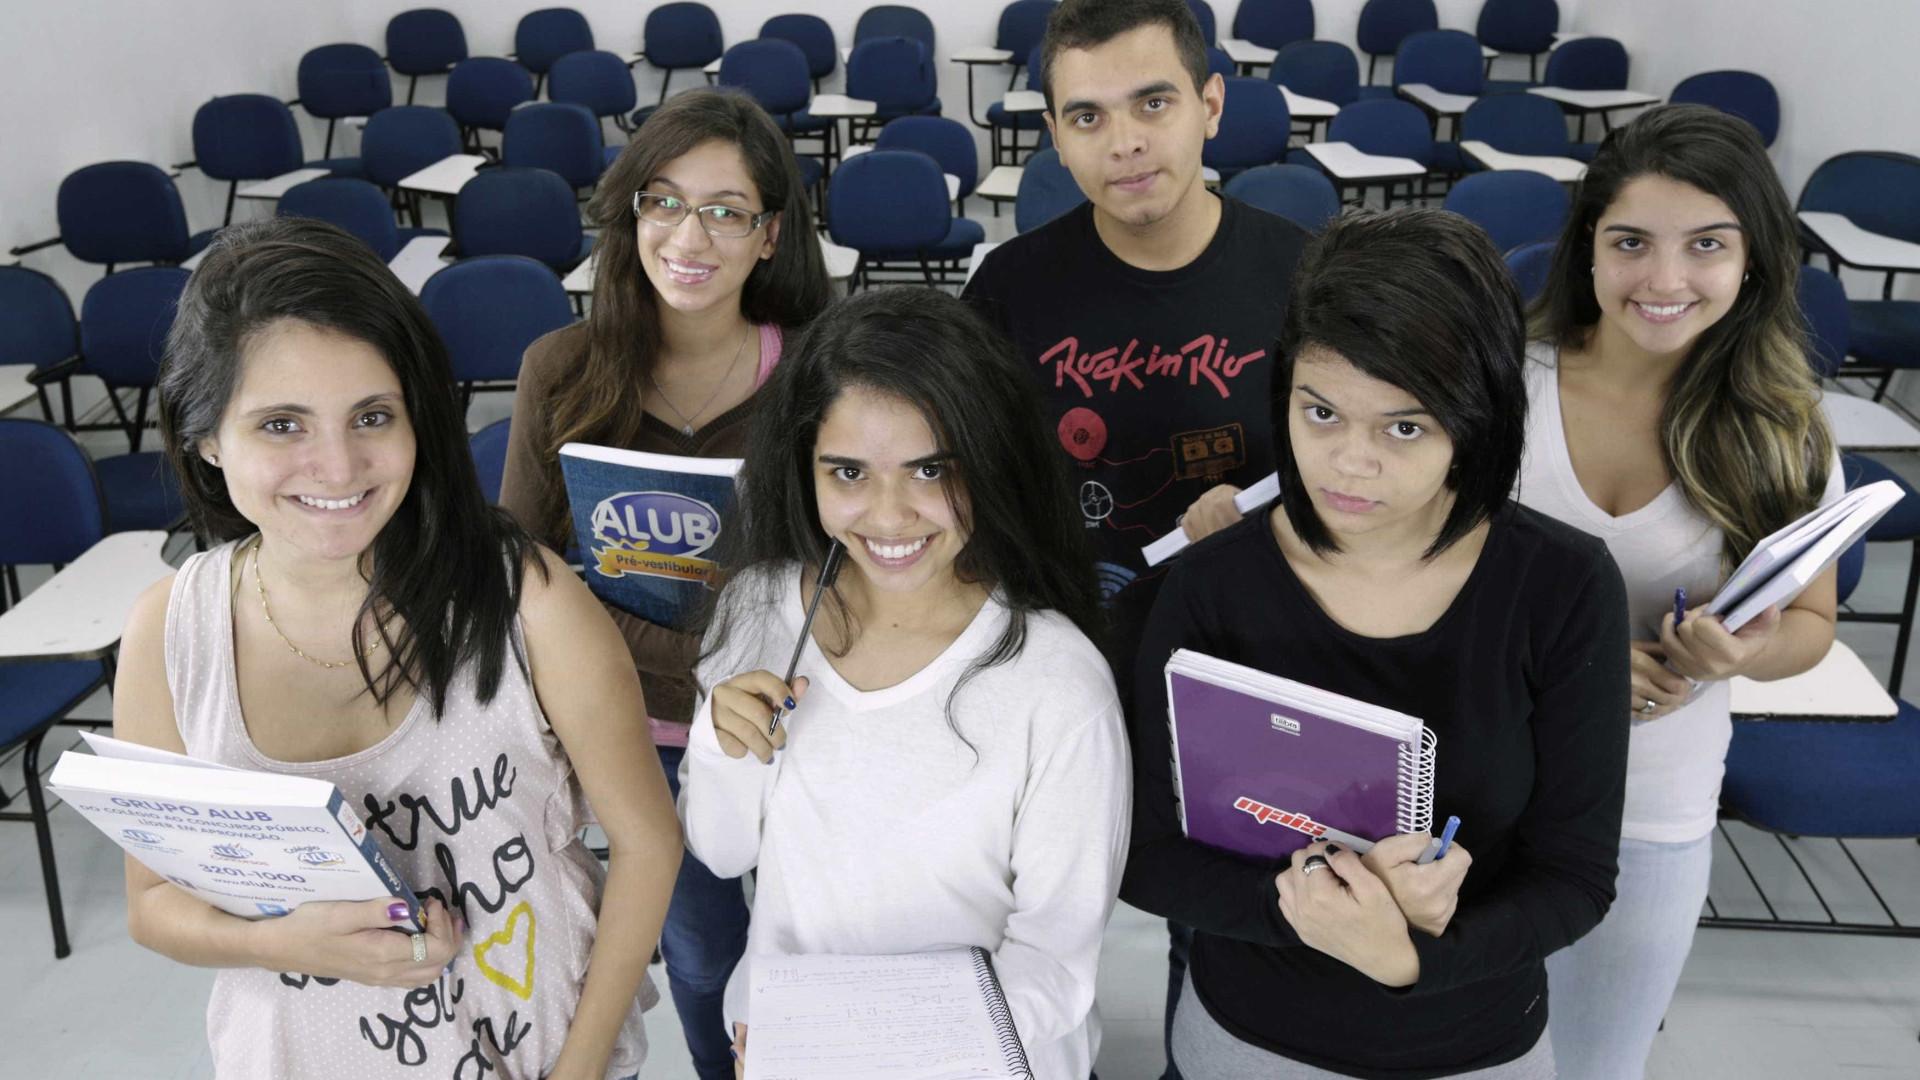 FGTS poderá ser liberado para pagamento de dívida estudantil